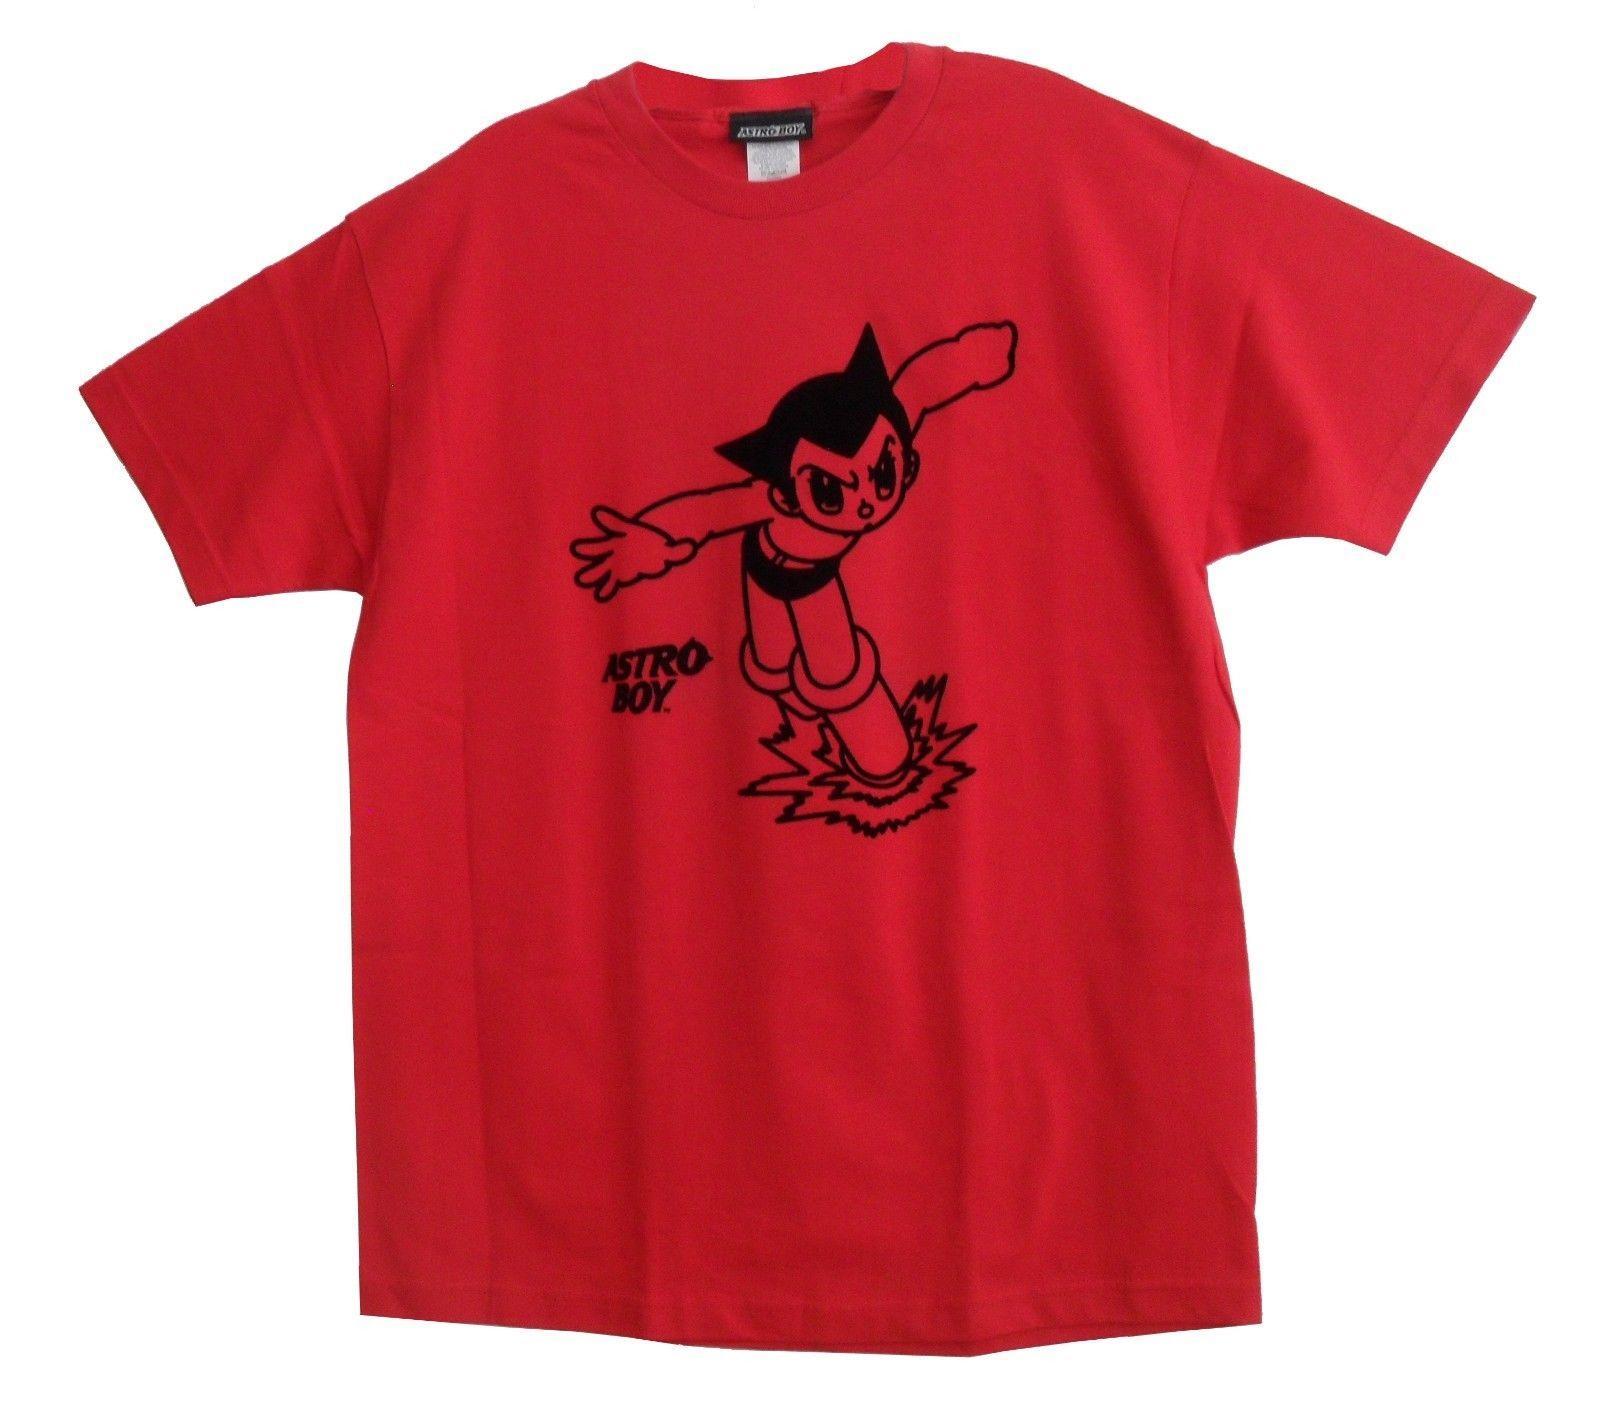 25d6a1764 Japanese Anime Astro Boy Men's T-shirt Red Mighty Atom manga by Osamu  Tezuka Comfortable t shirt Casual Short Sleeve Print